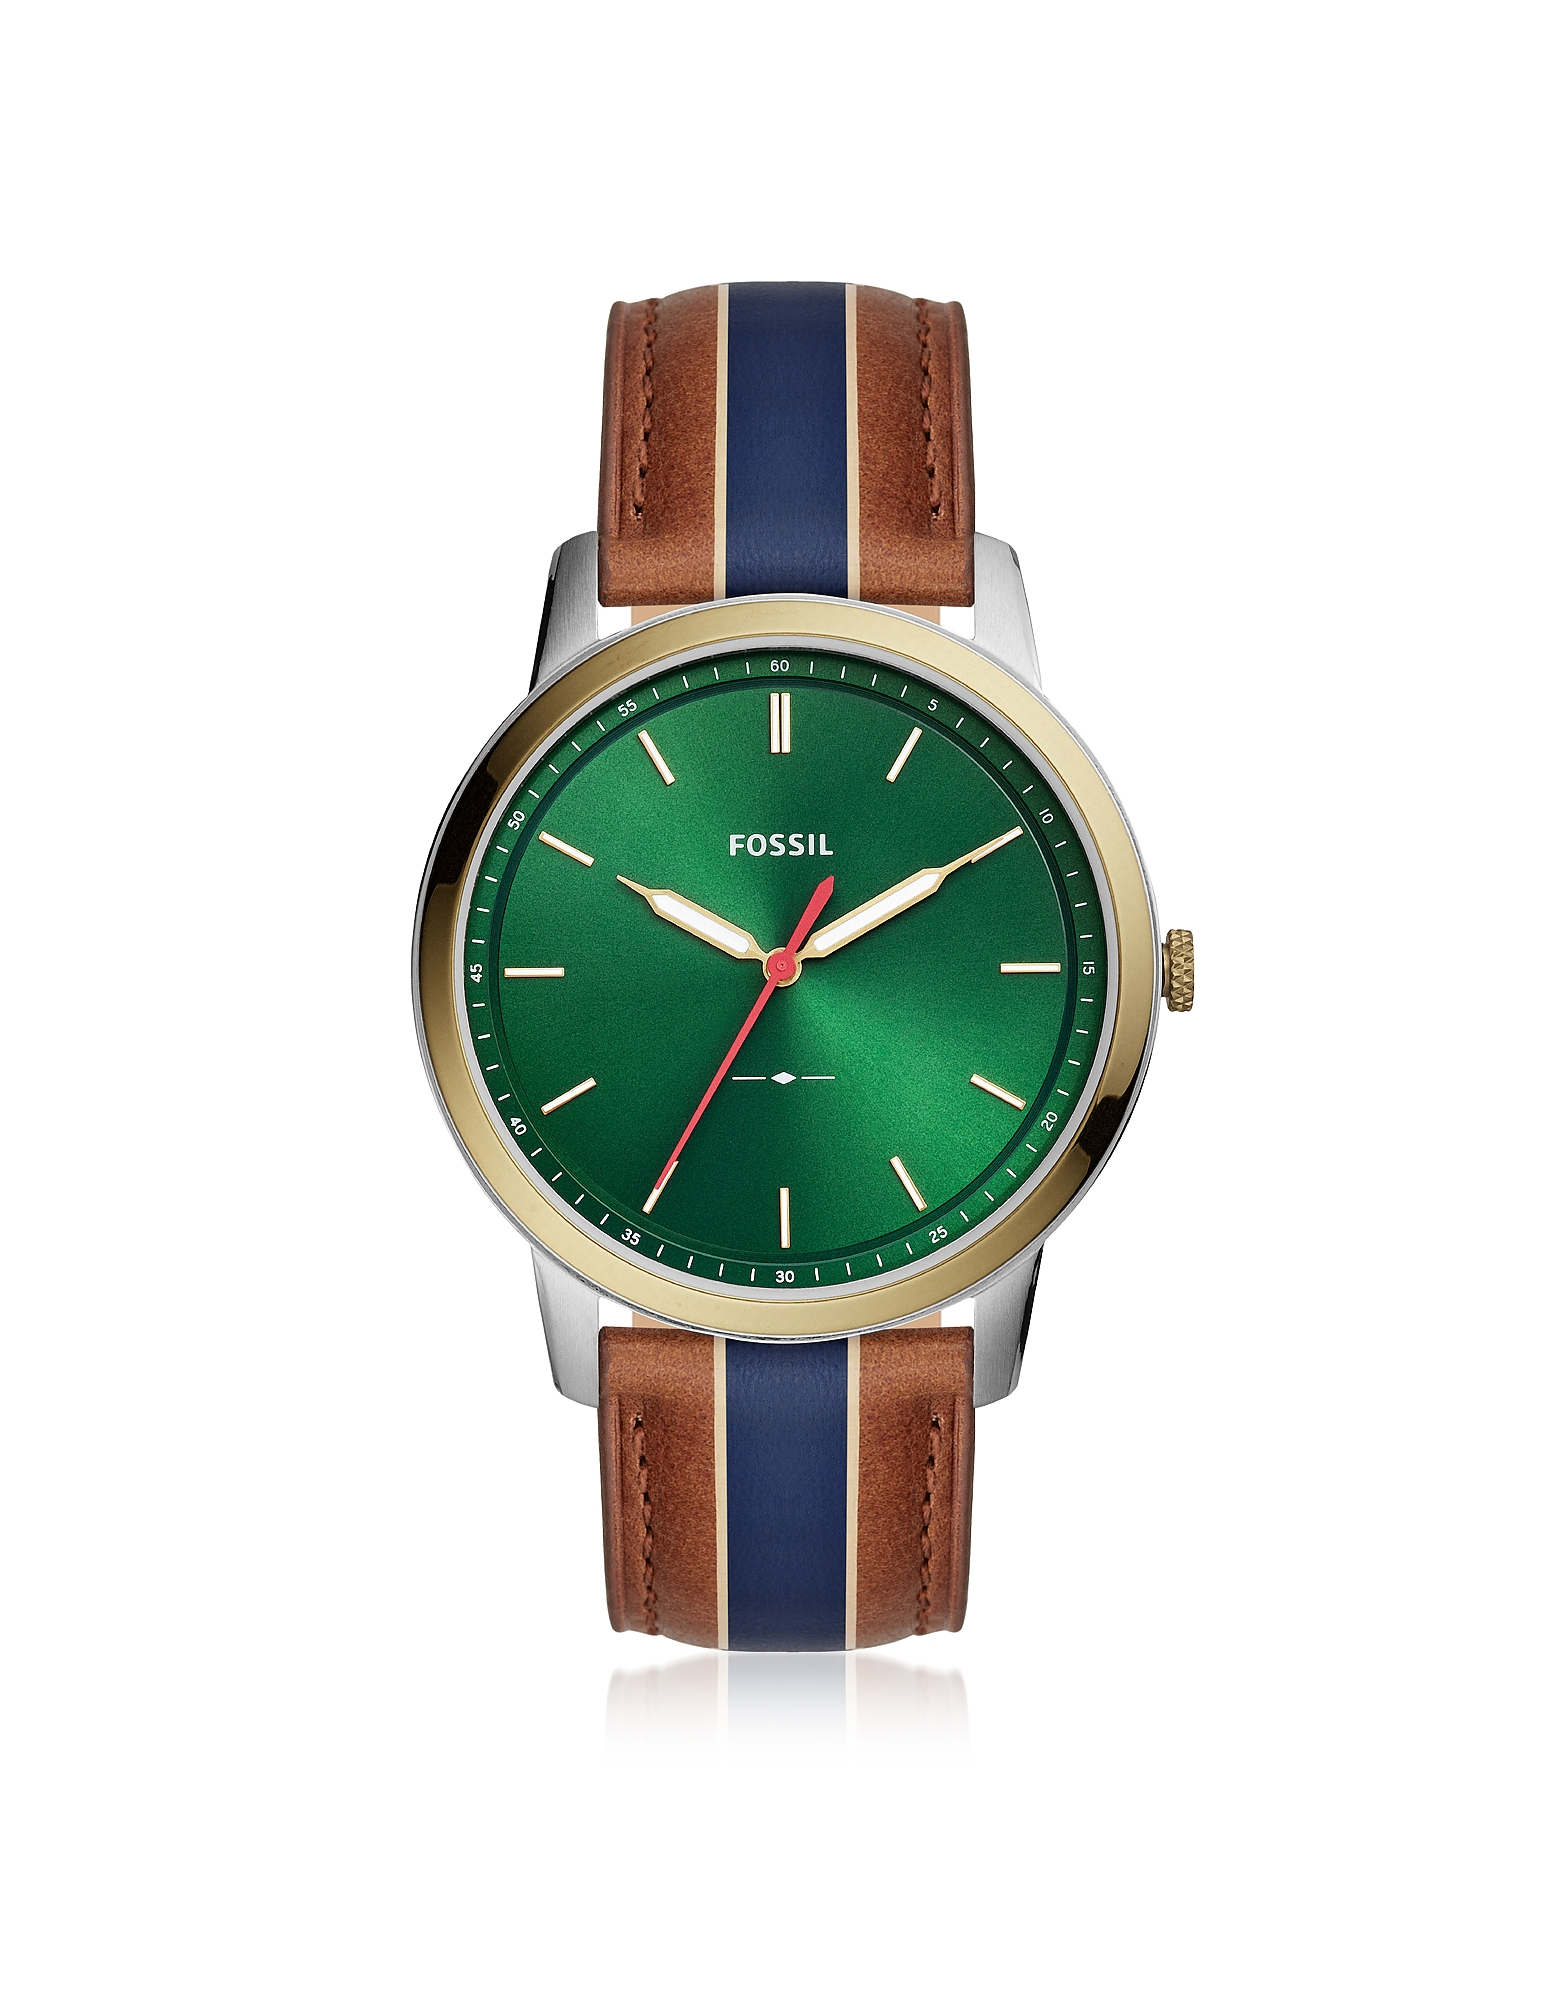 The Minimalist Three-Hand Striped Tan Leather Watch